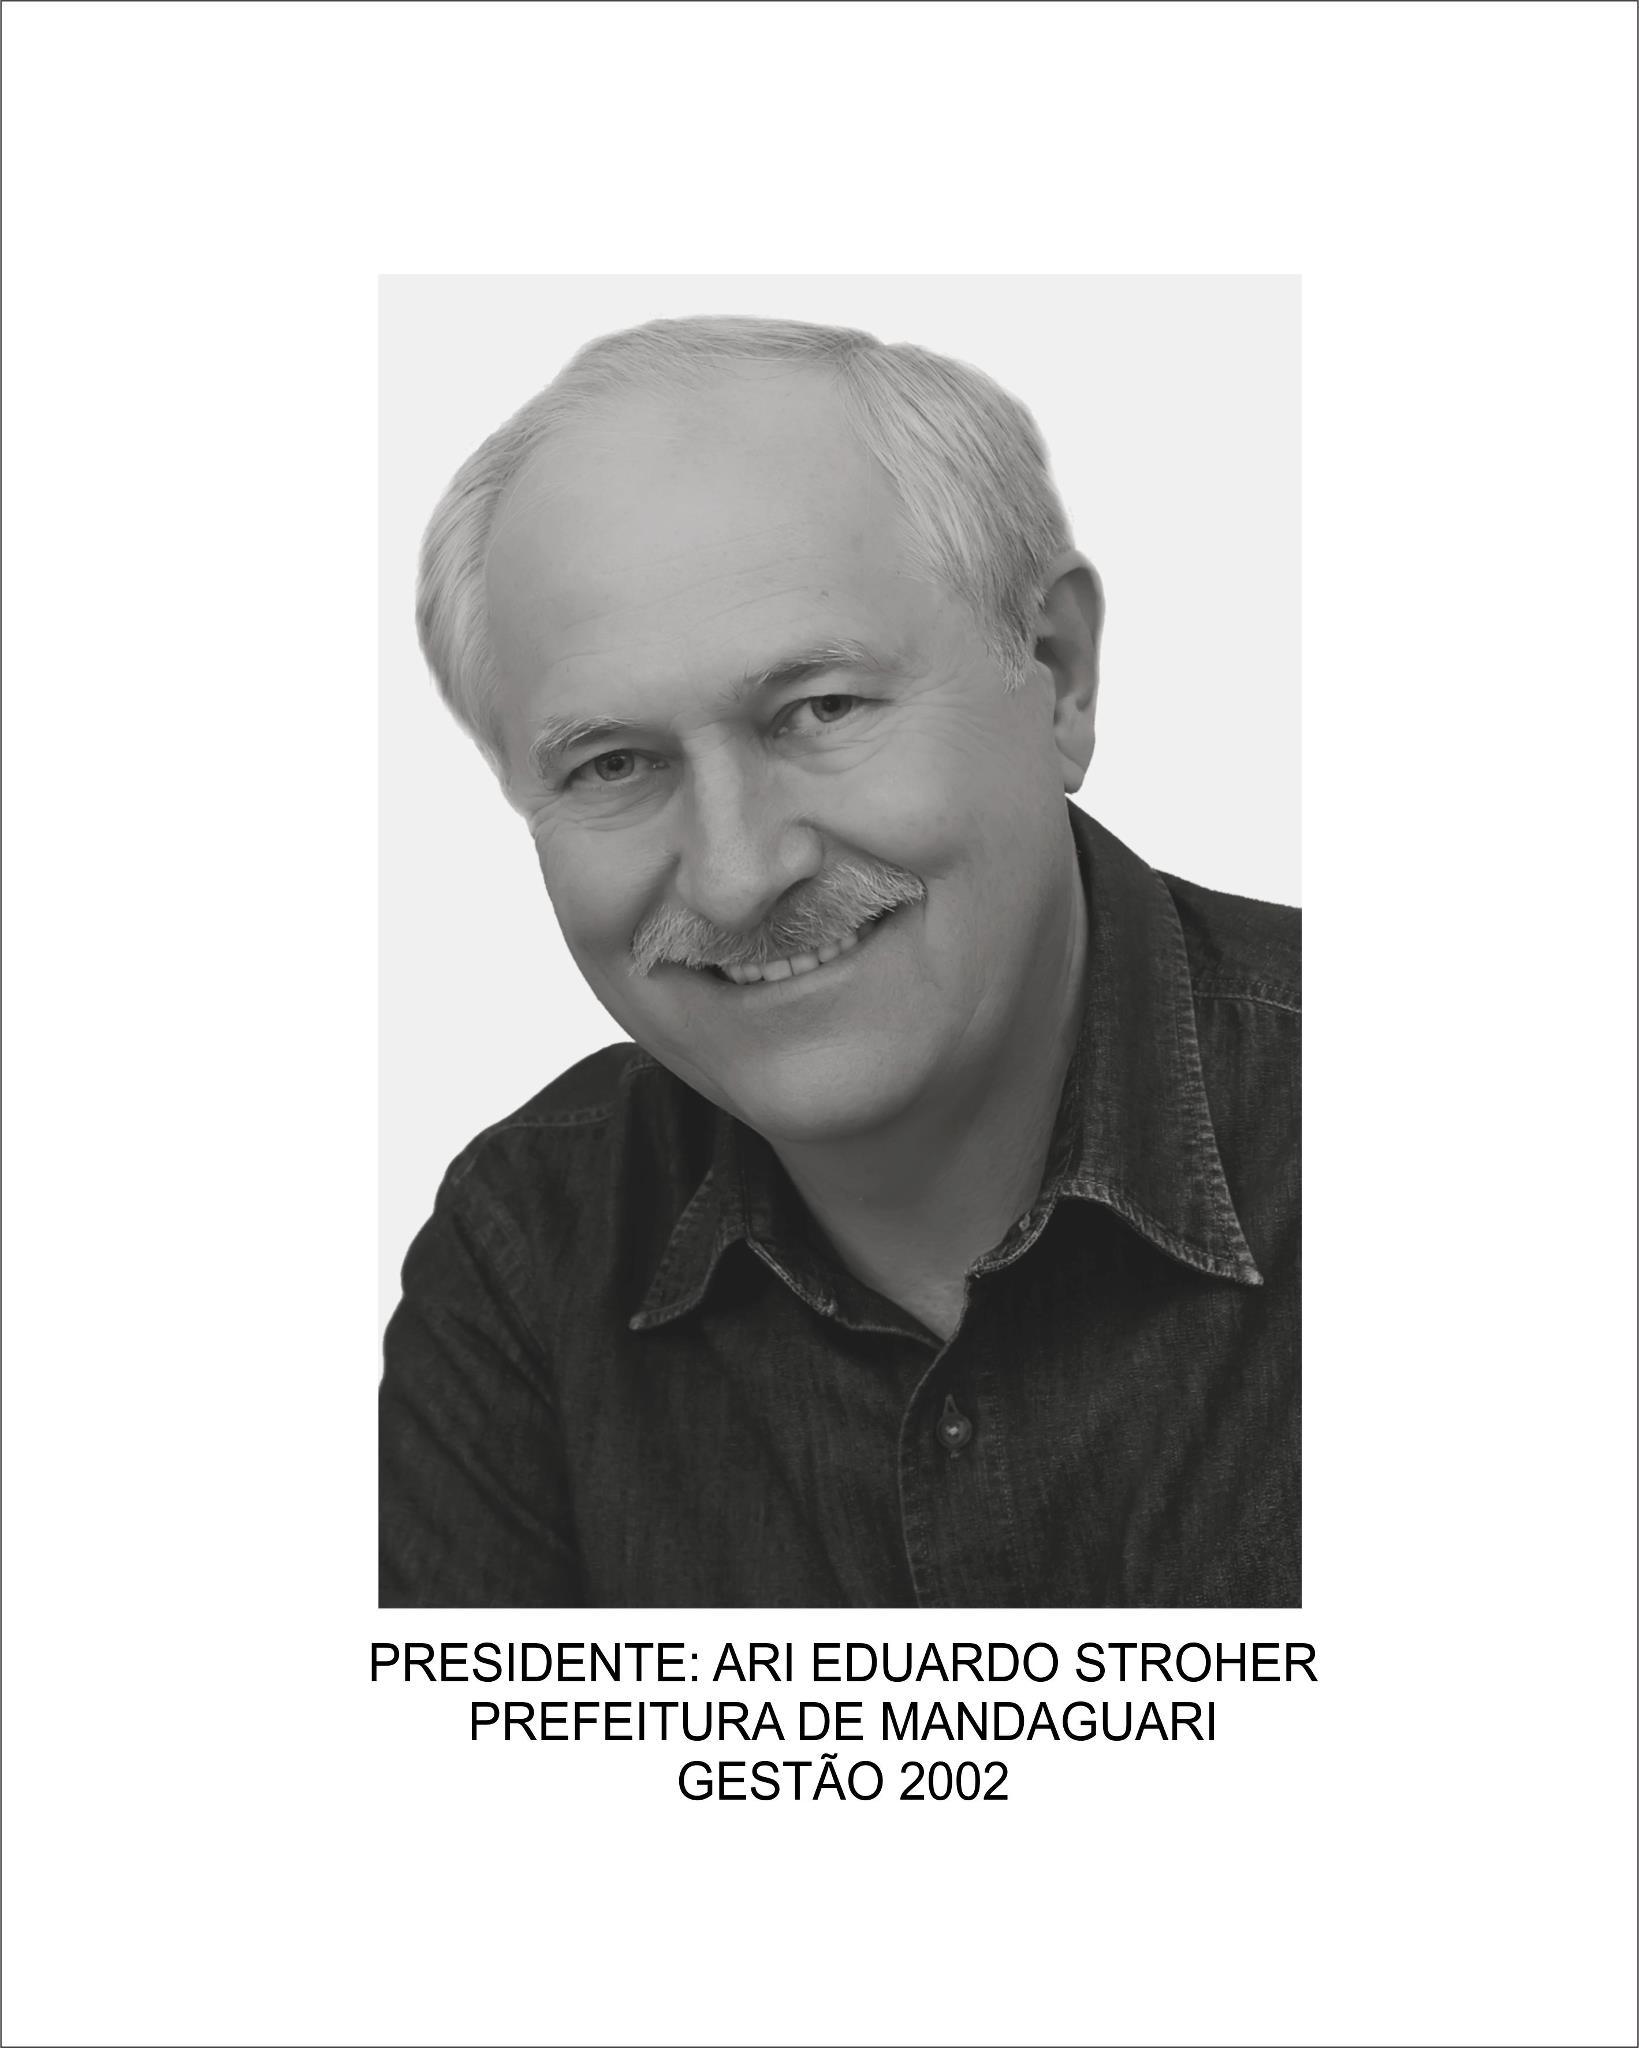 Ari Eduardo Stroher